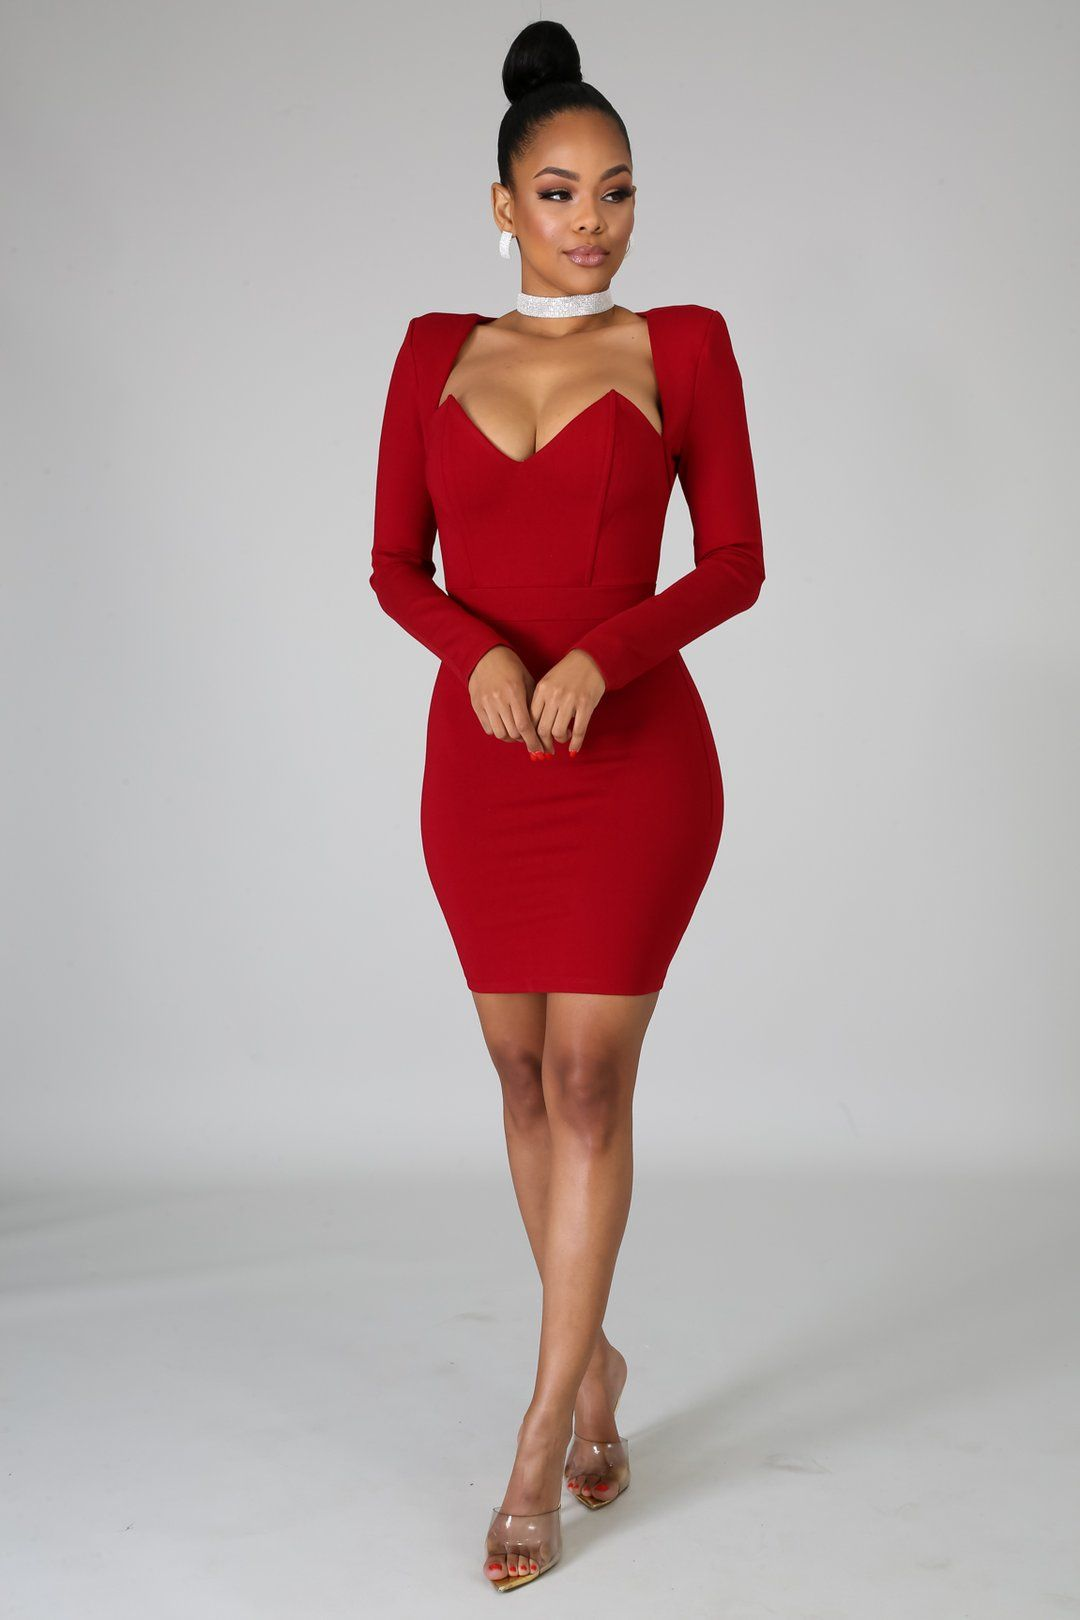 Baddie Body Con Dress Style 4190descriptionthis Baddie Body Con Dress Features A Stretchy Fabric V Neckl In 2021 Bodycon Dress Red Bodycon Dress Party Dress Classy [ 1620 x 1080 Pixel ]